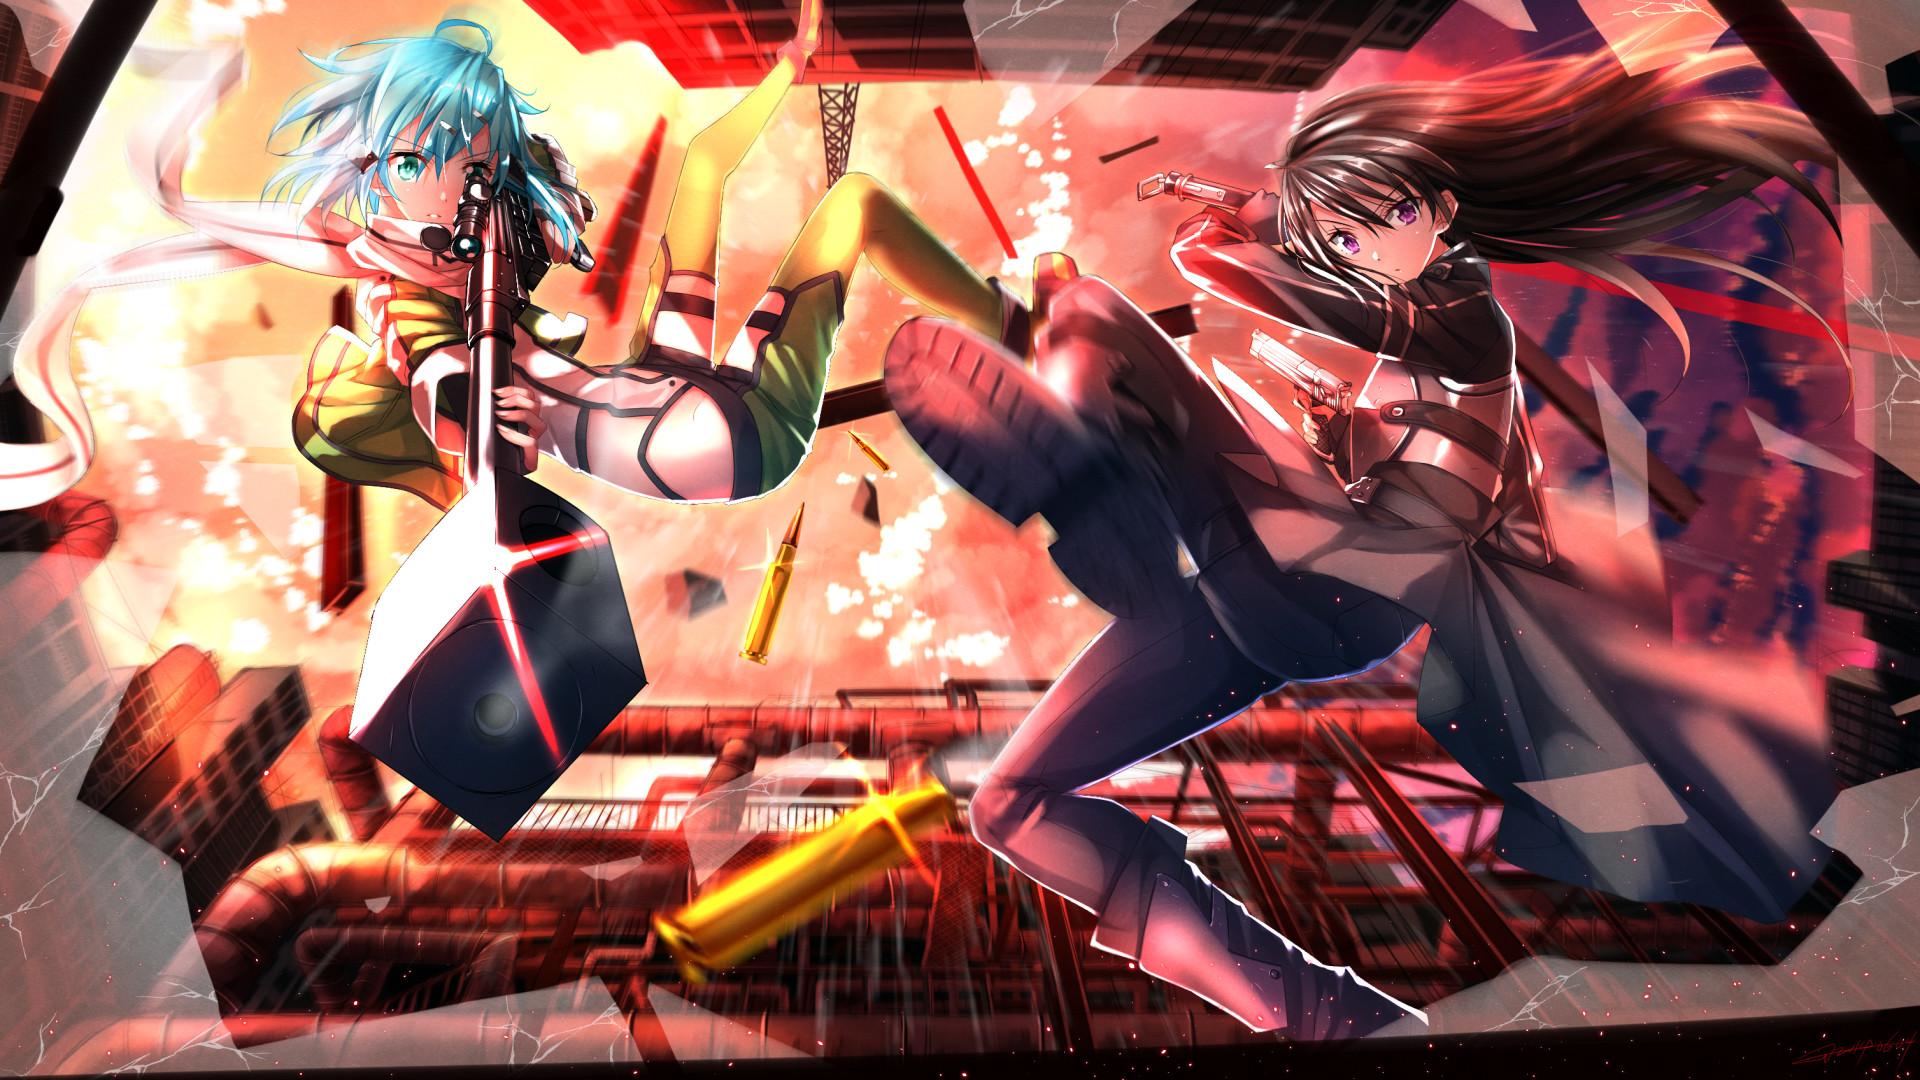 Anime Girls Asada Shino Blue Hair Broken Glass Bullets Bullet Shells Guns  Motion Blur Short Sniper Rifles Sunset Sword Art Online Swords …